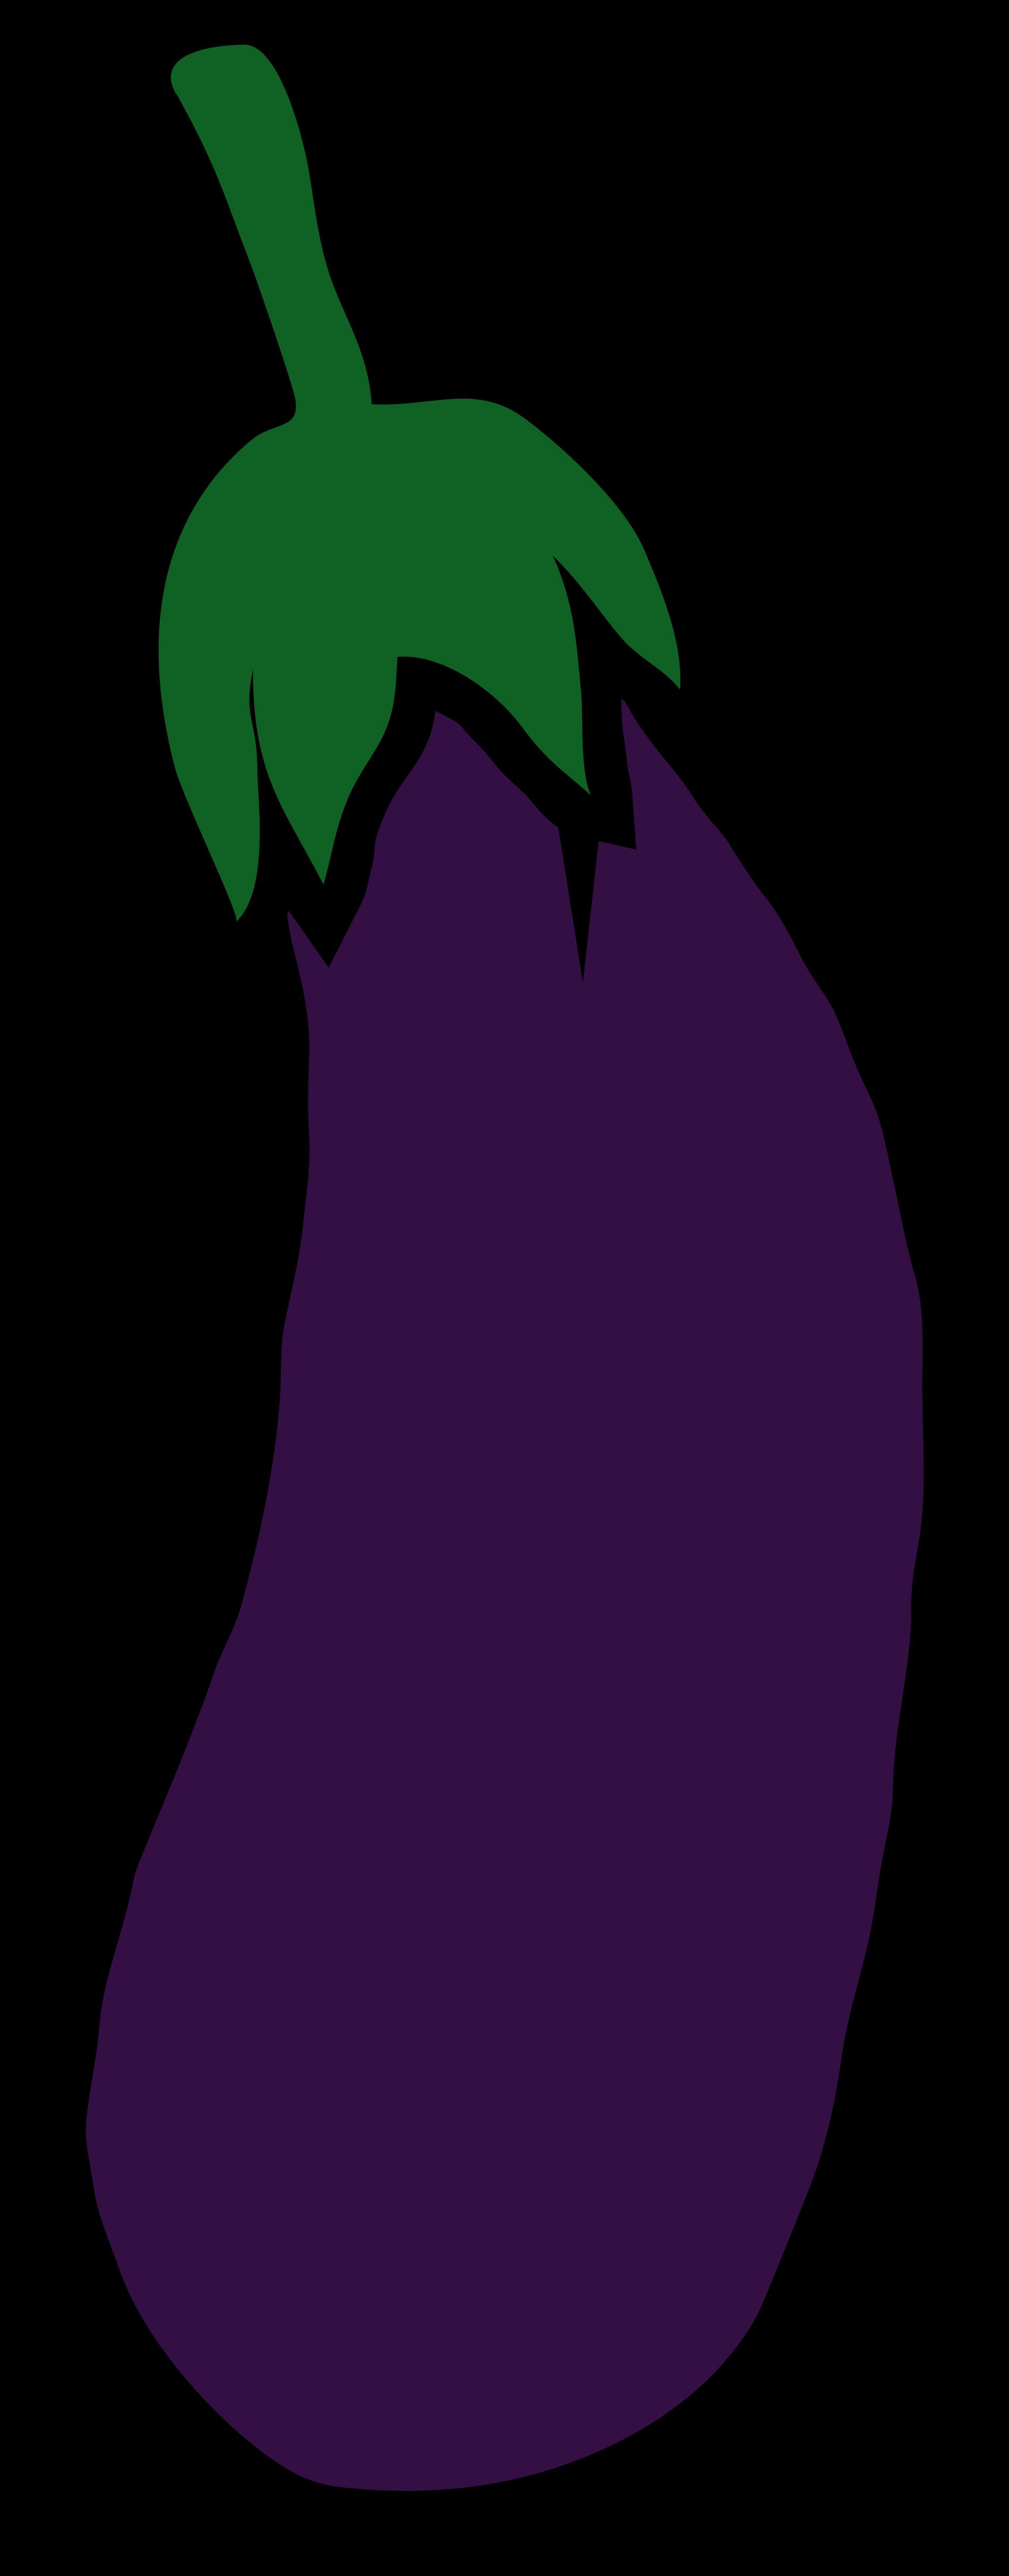 Transparent brinjal clipart - File Aubergine Wikimedia Commons - Eggplant